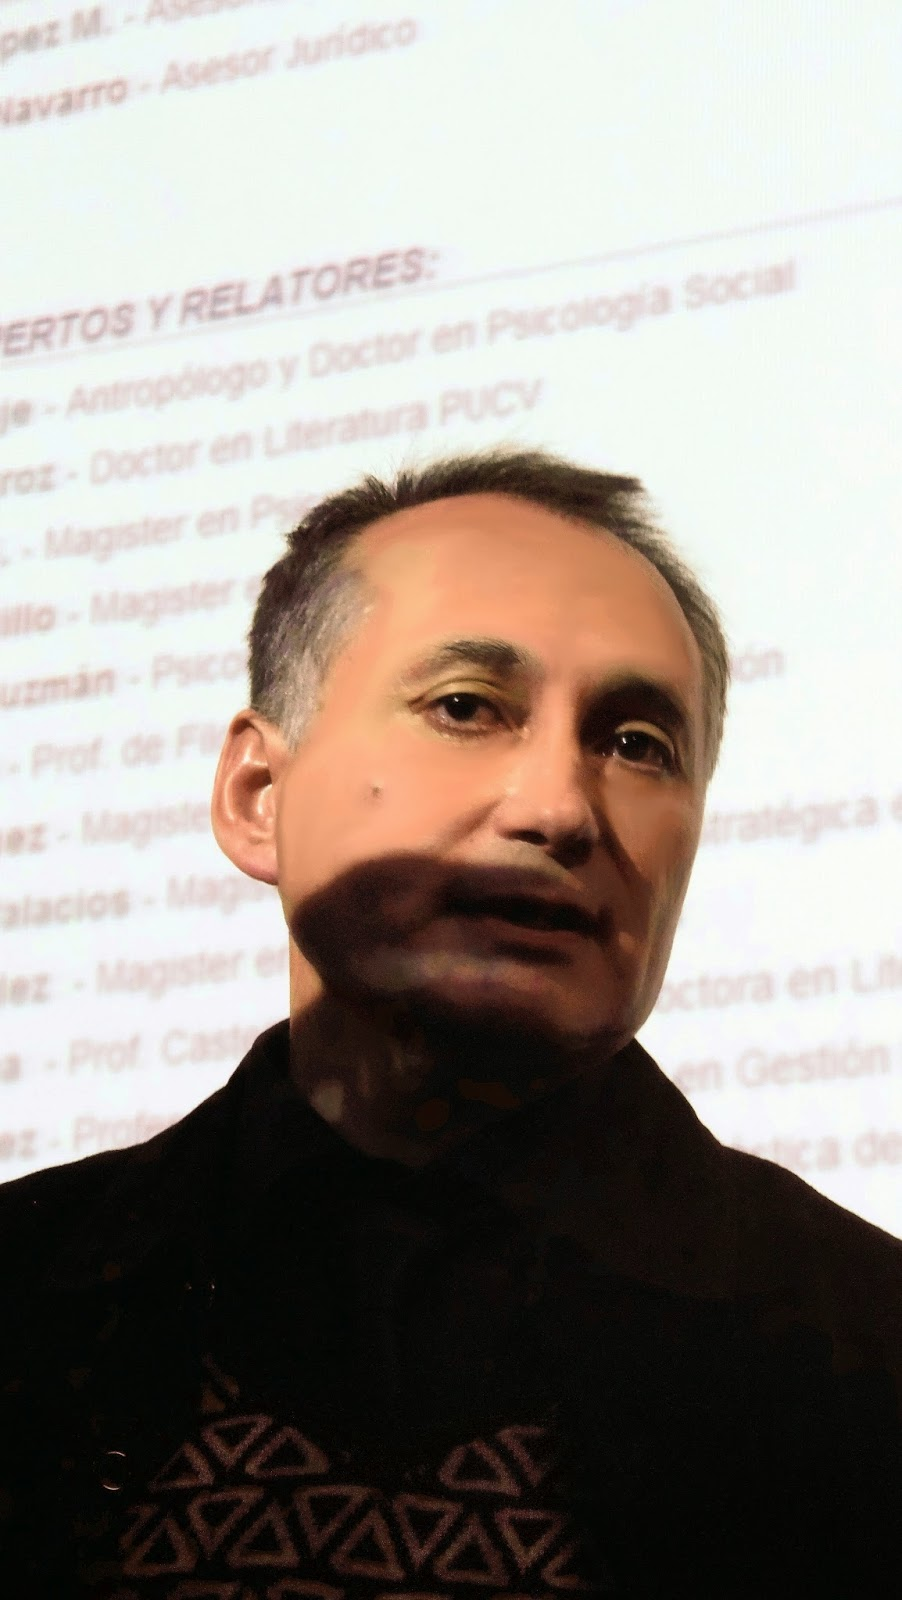 http://1.bp.blogspot.com/-CNwMt3o_cRo/U3e6MvwjQAI/AAAAAAAATlM/muQll6S4Ye4/s1600/+Adolfo+Vasquez+Rocca+D.Phil+_+Consultor+Academico+Senior+D_+Filosofia+Contemporaneo+2014+_+D.jpeg